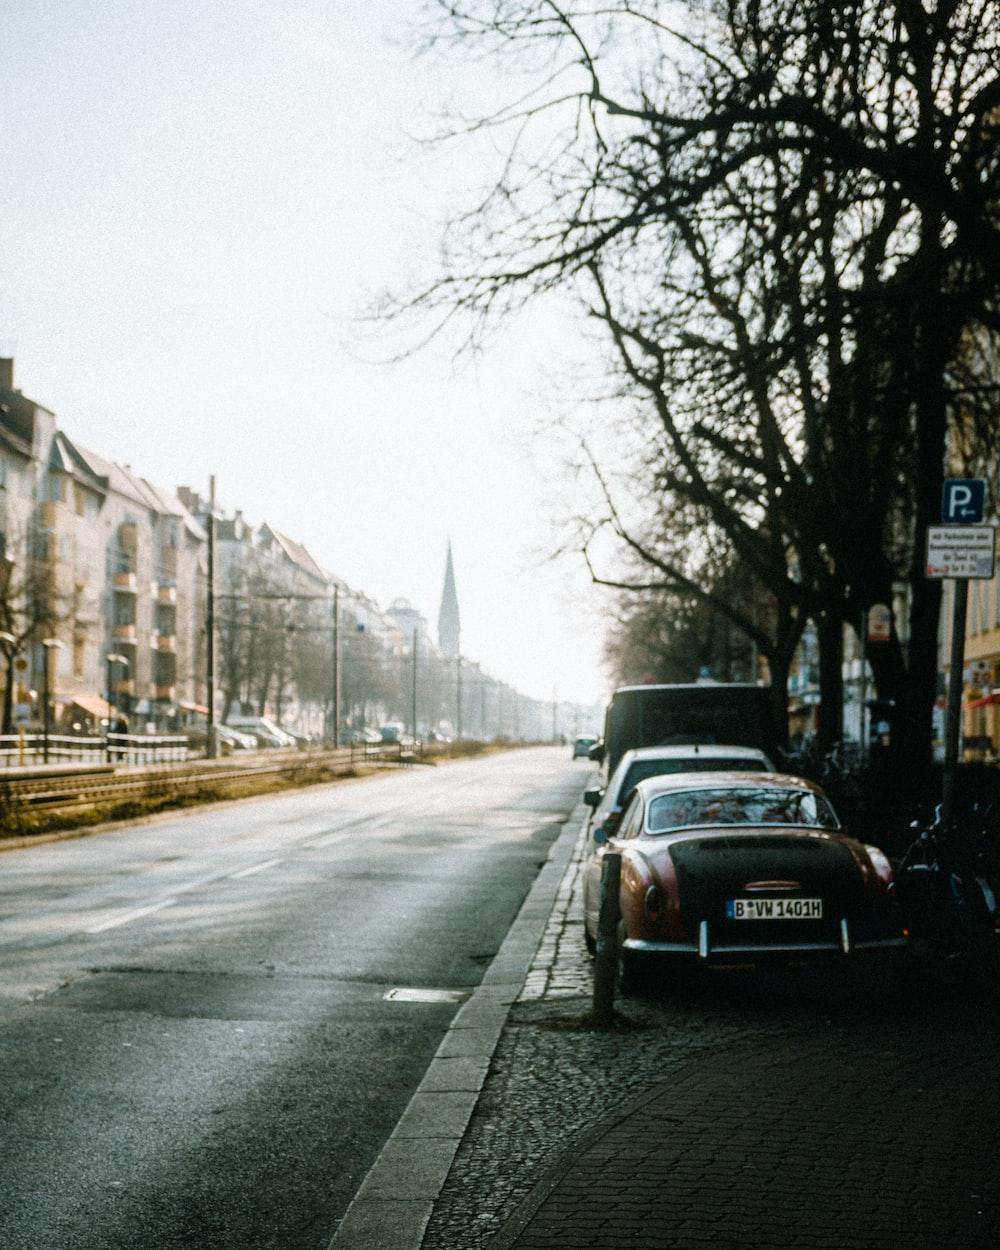 vehicles on roadside during daytime